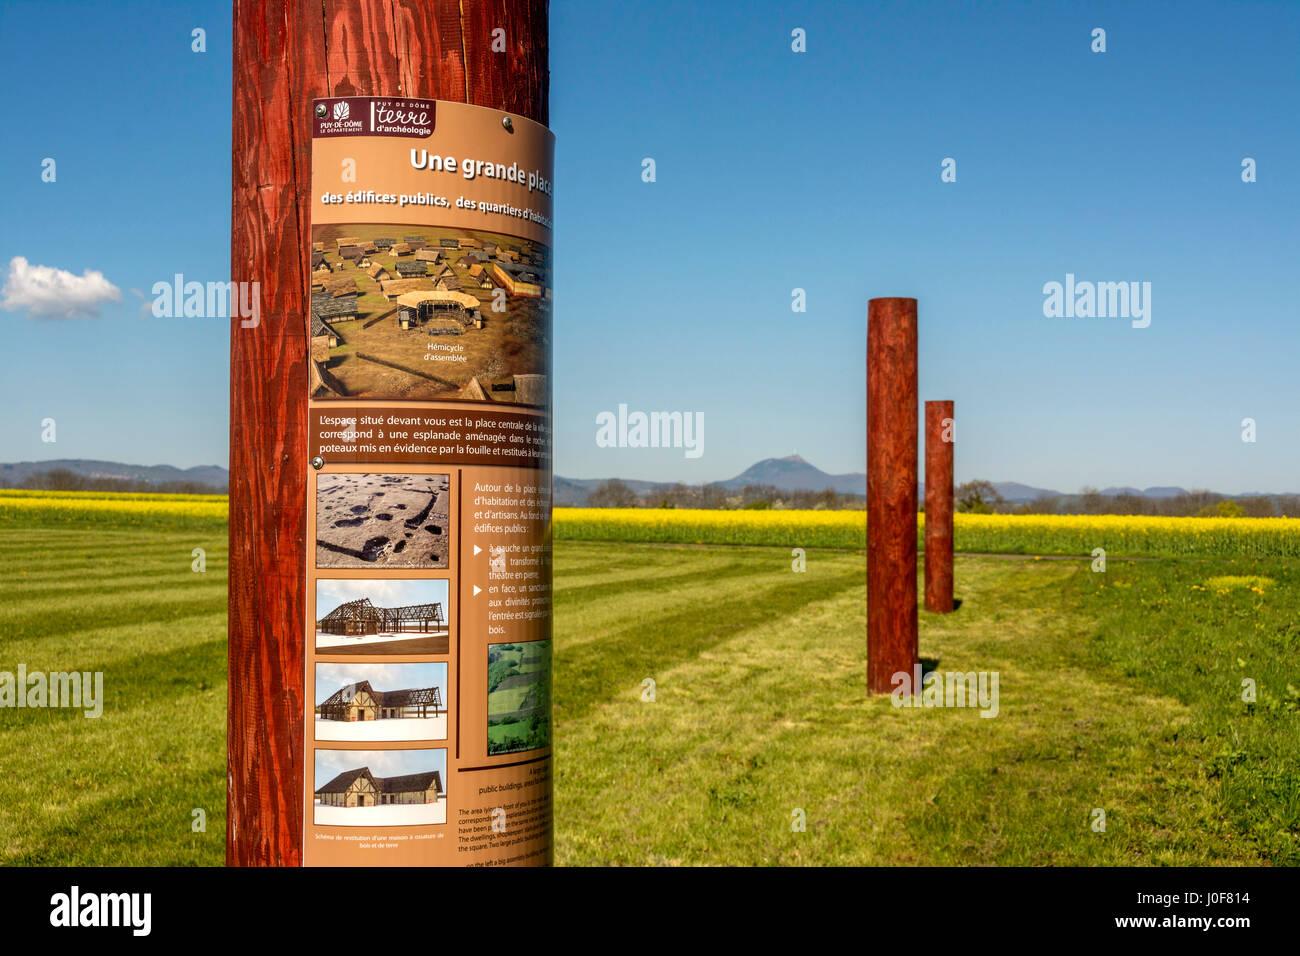 Oppidum galo de Corent, sitio arqueológico, Puy de Dôme, Francia, Europa Foto de stock